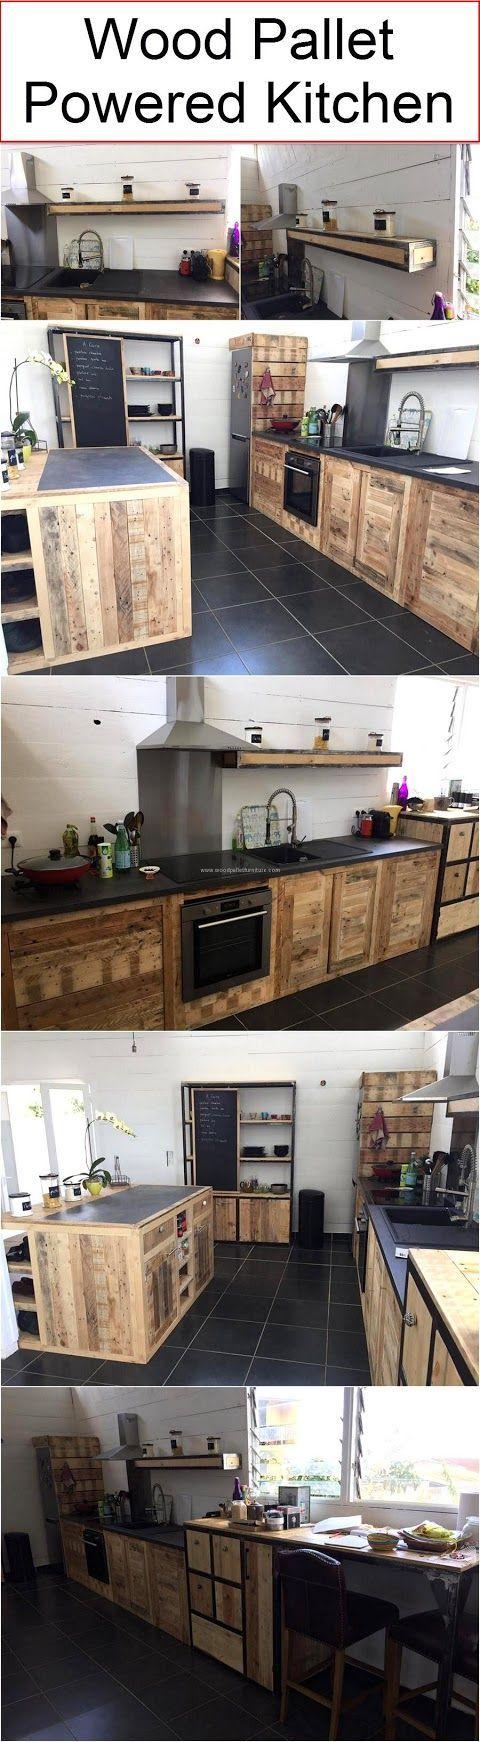 kitchen cabinet styles kitchen cabinet styles Kitchen cabinets